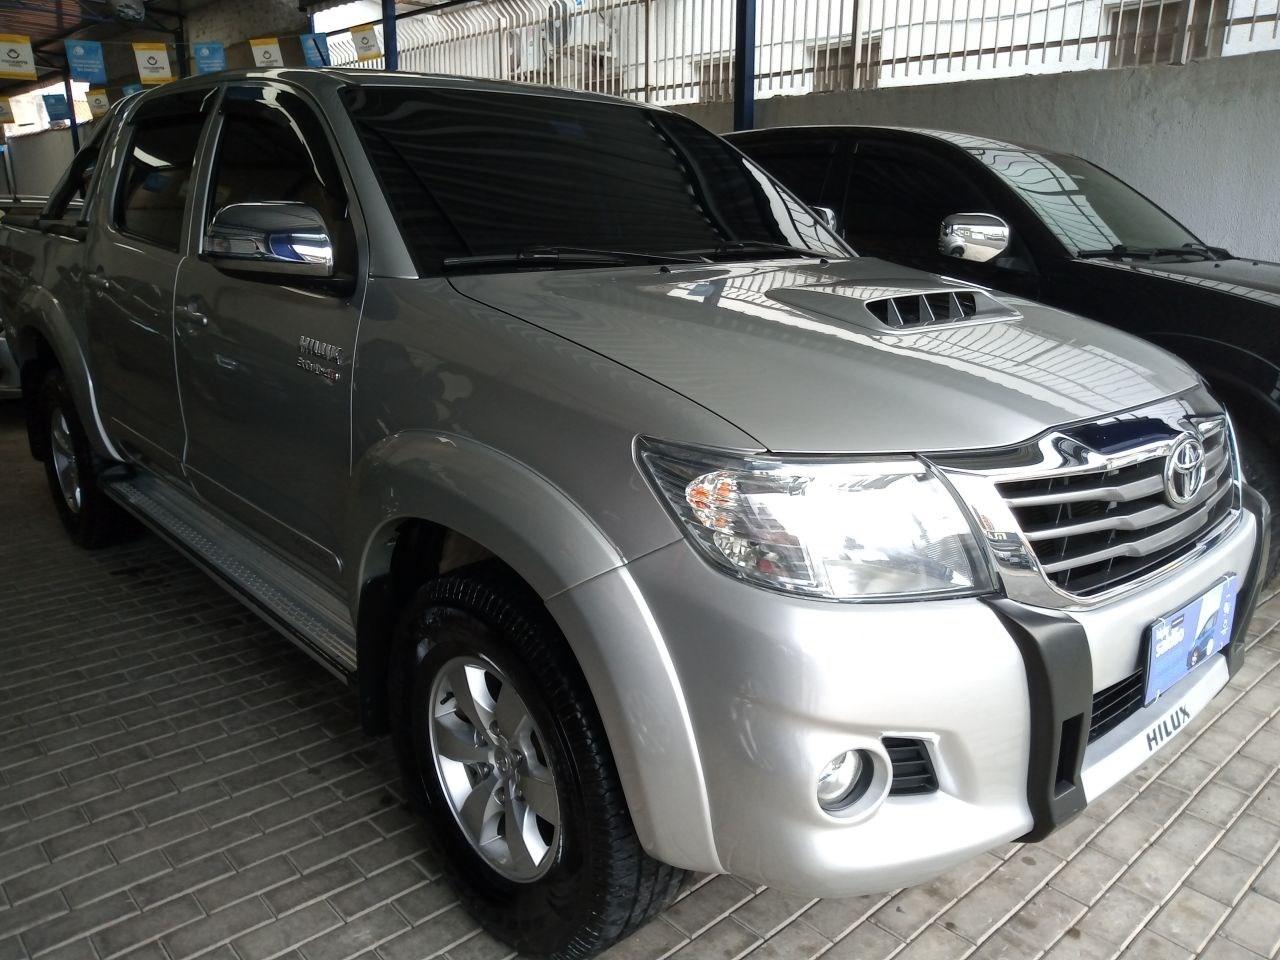 //www.autoline.com.br/carro/toyota/hilux-30-cd-srv-16v-diesel-4p-4x4-turbo-automatico/2014/salto-sp/14896349